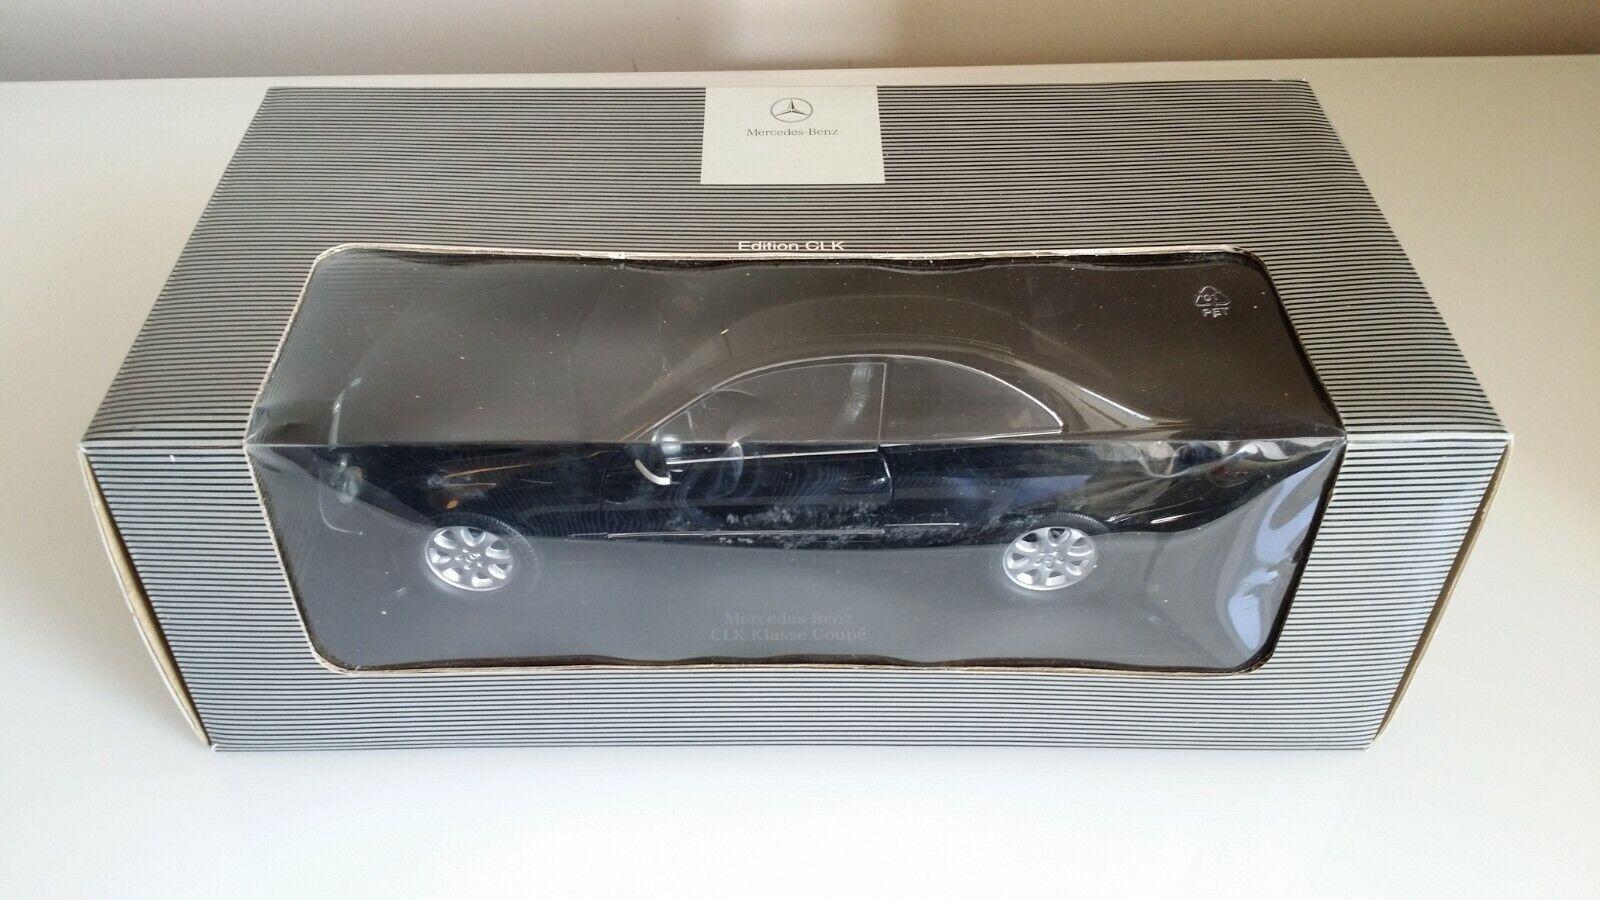 Mercedes Benz CLK Coupe Dealer Model 1 18 MIB Boxed